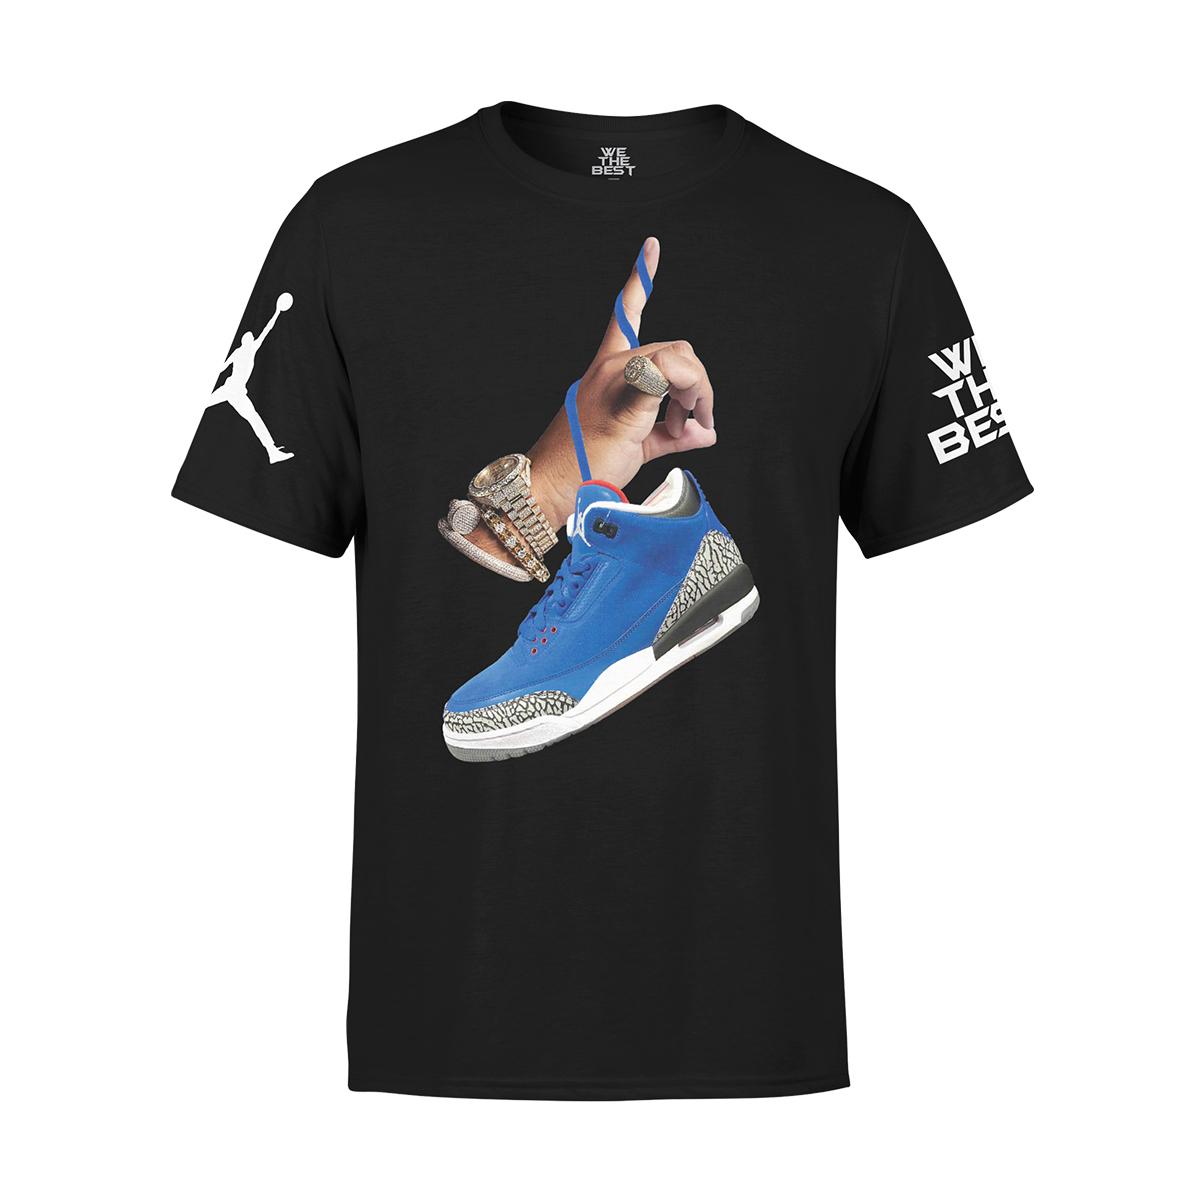 DJ Khaled x Jordan Suede Sneakers T-shirt - Black